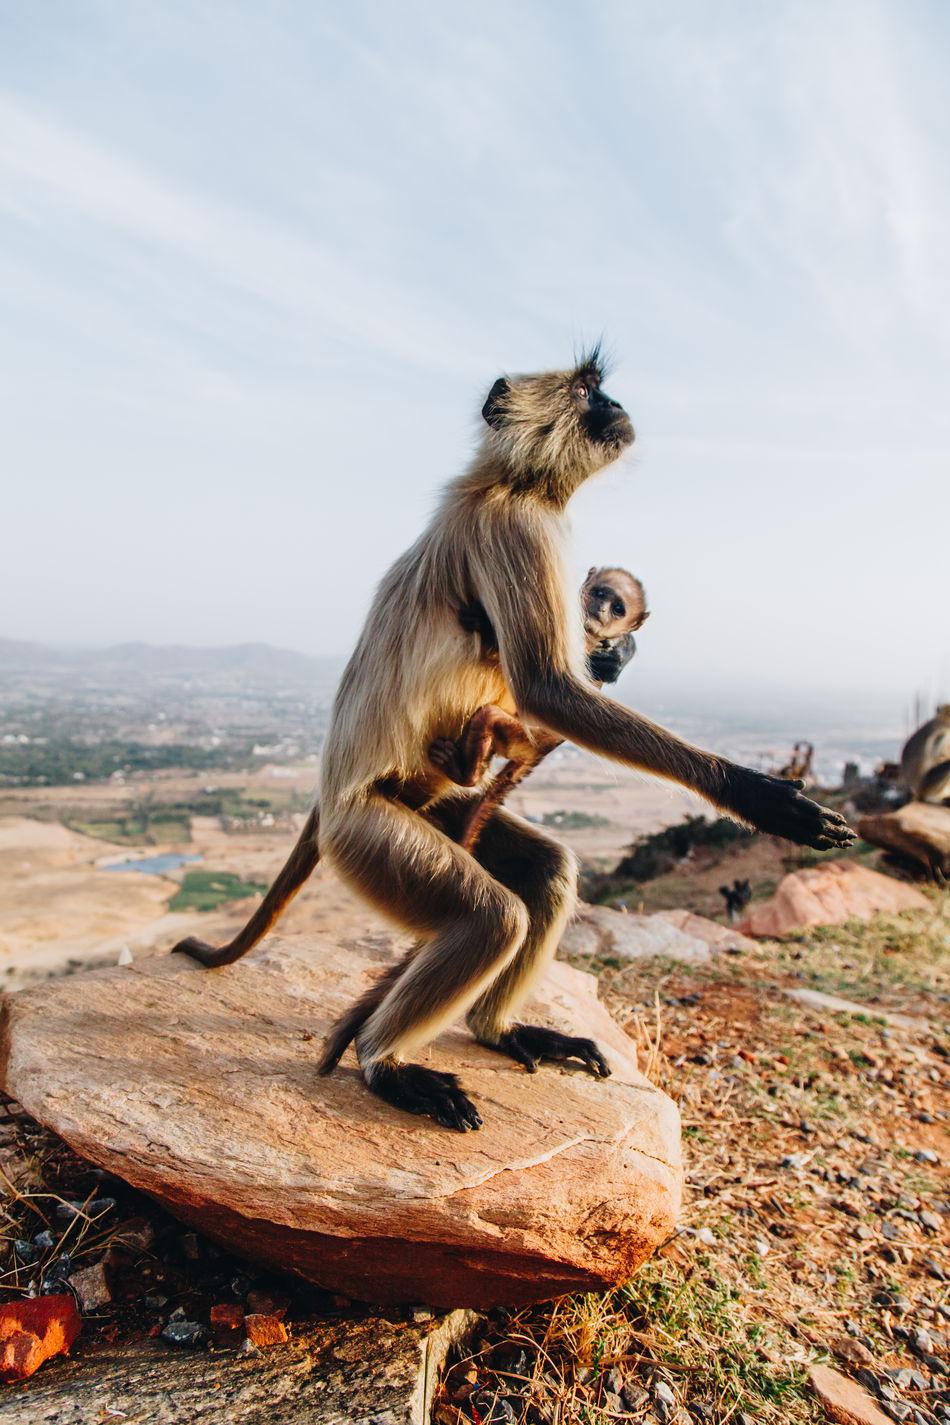 Animal Themes Animal Wildlife Animals In The Wild Baby Monkey Close-up Day Full Length Gray Langur Gray Langurs India Mammal Monkey Nature No People Outdoors Primate Pushkar Sky Standing Wildlife